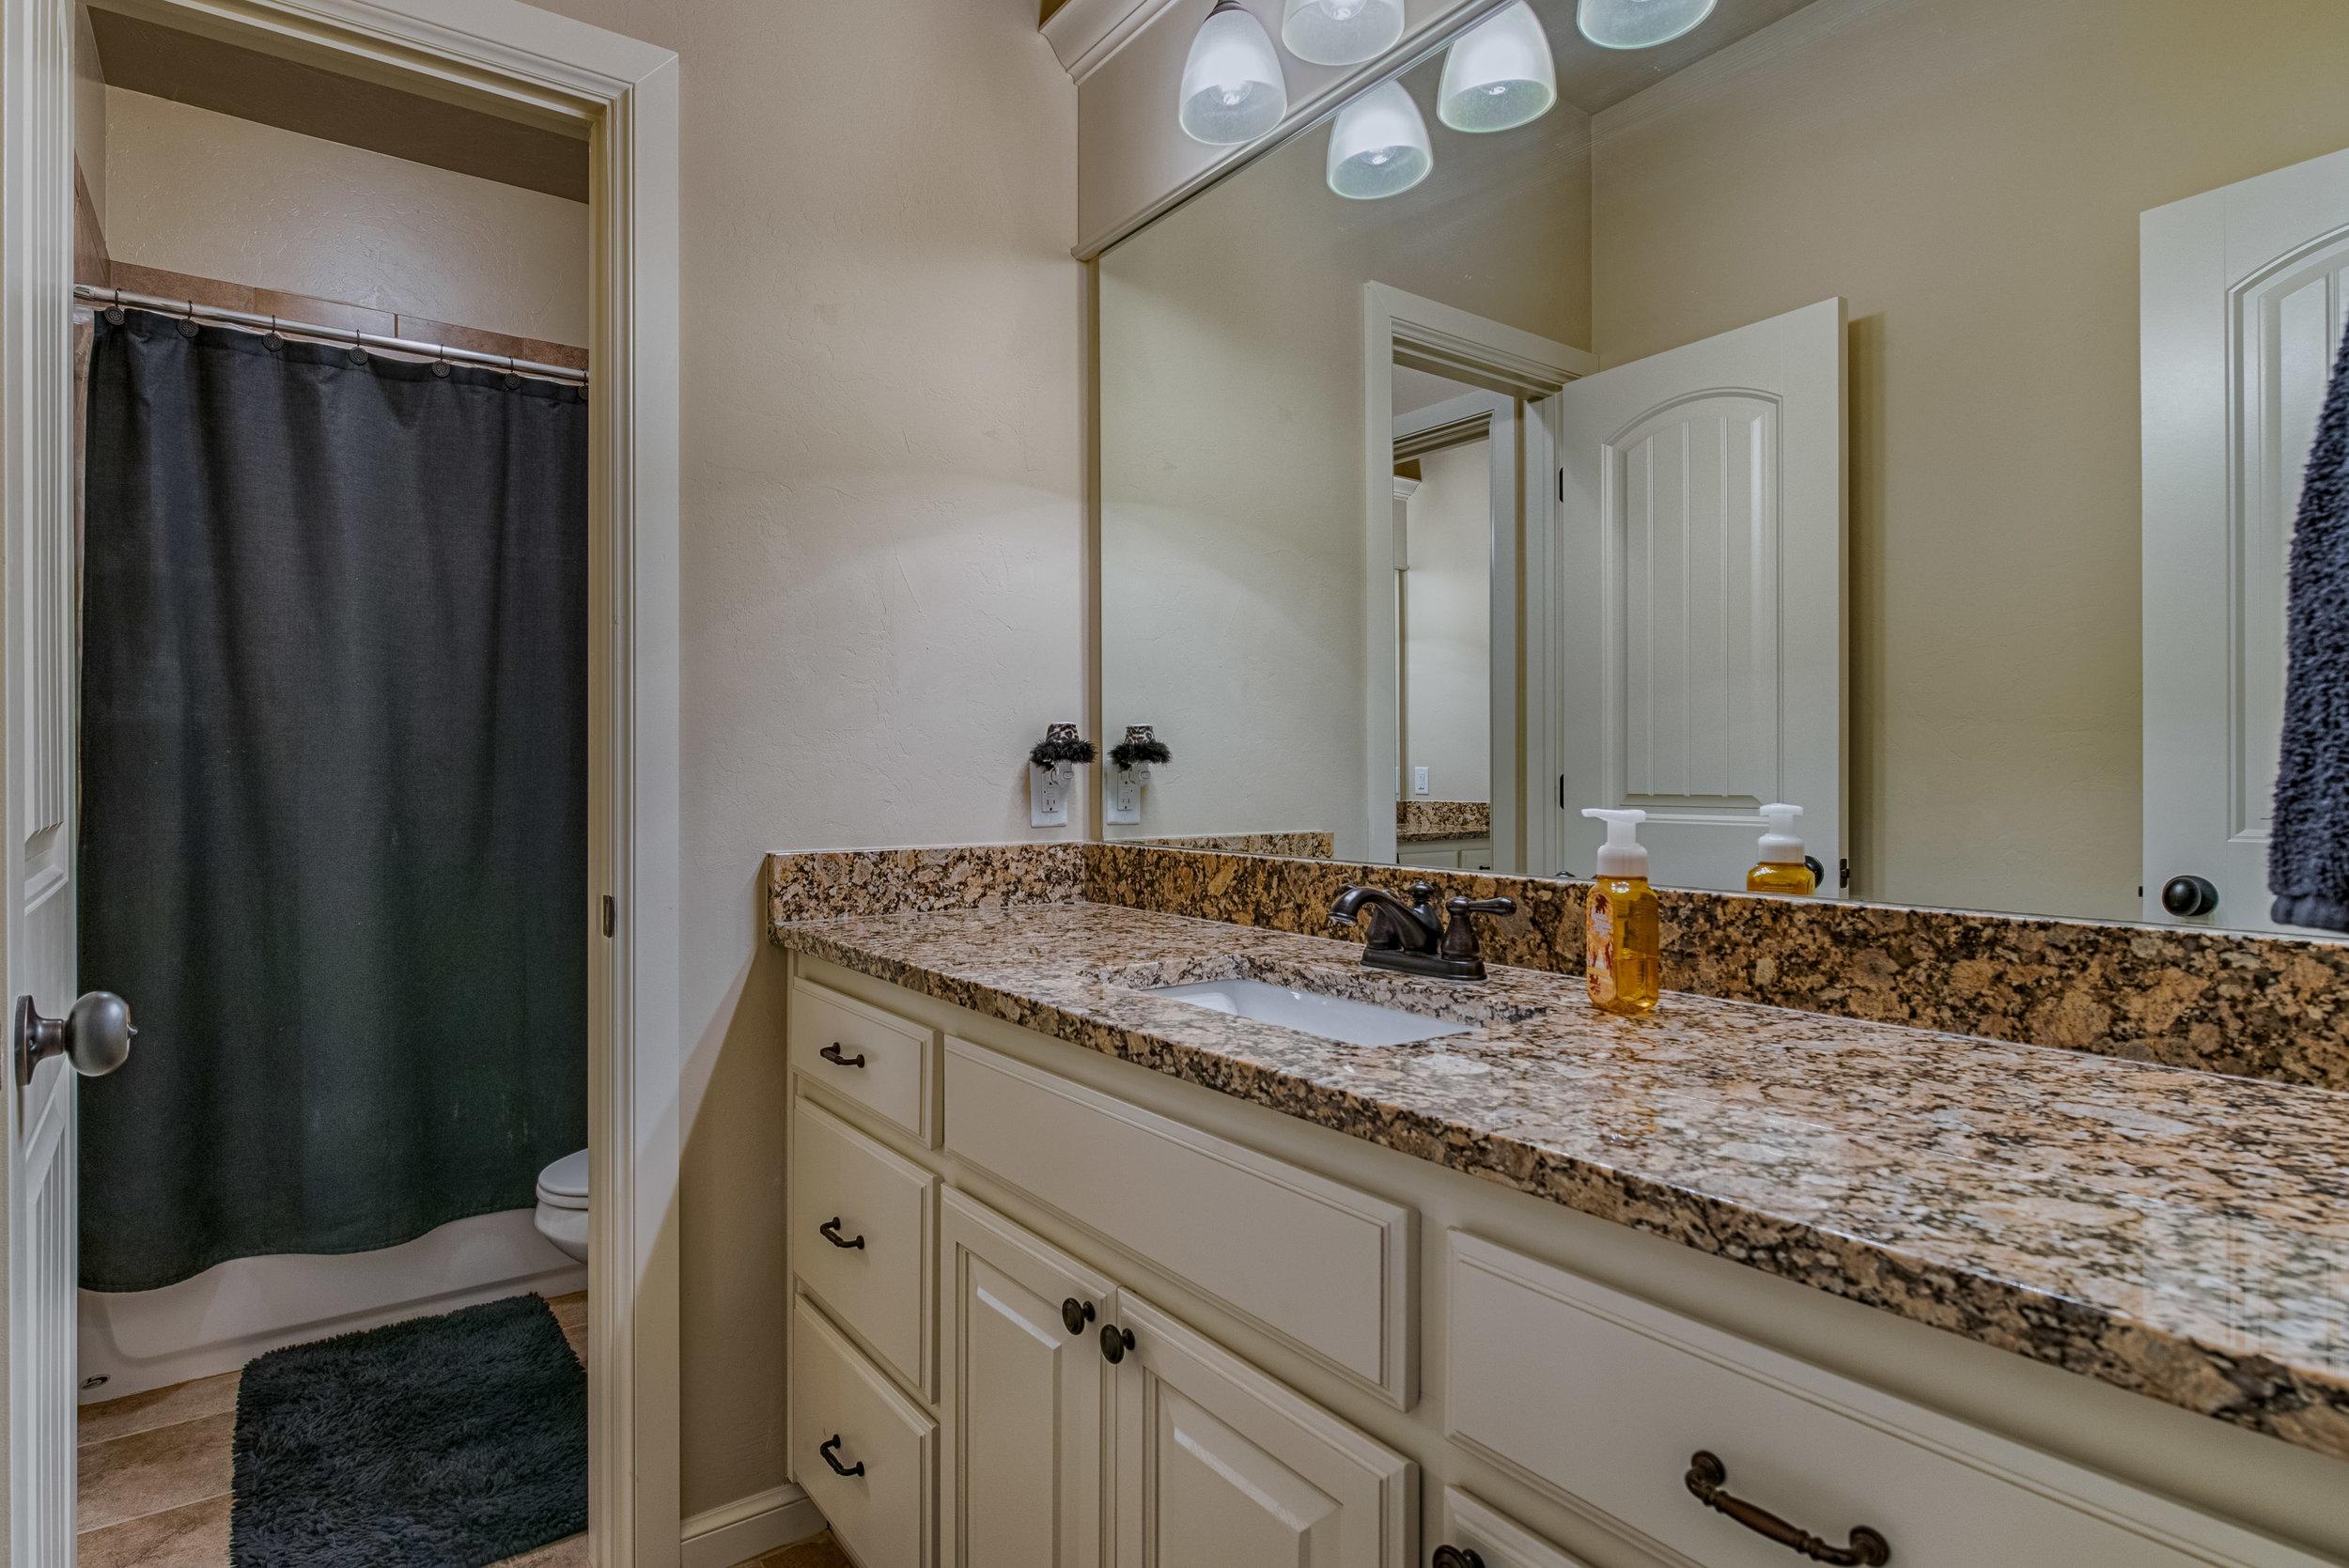 031-Jack & Jill Bathroom.jpg